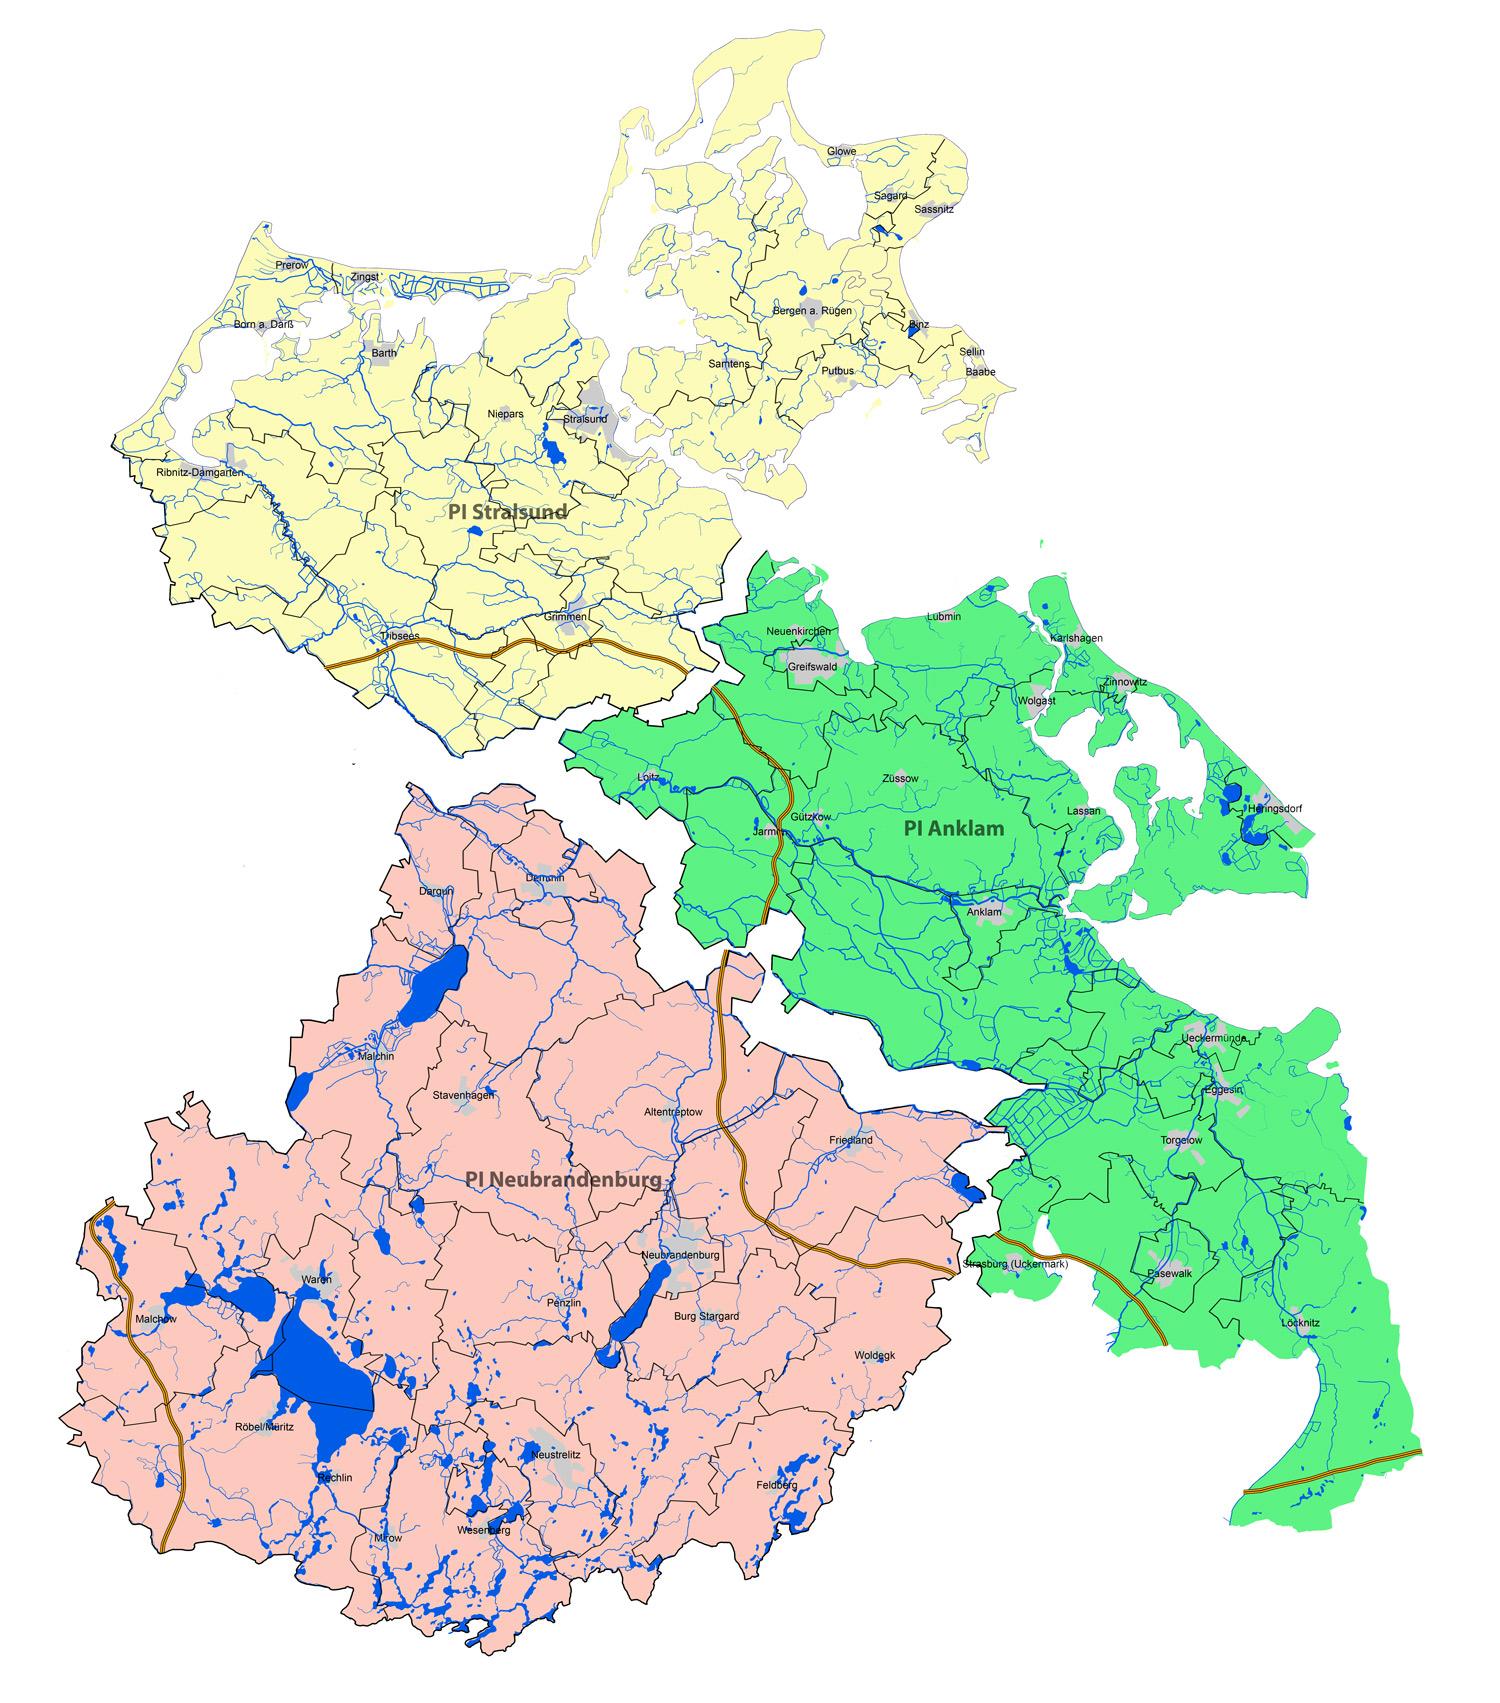 Mecklenburgische Seenplatte Karte Pdf.Polizeiprasidium Neubrandenburg